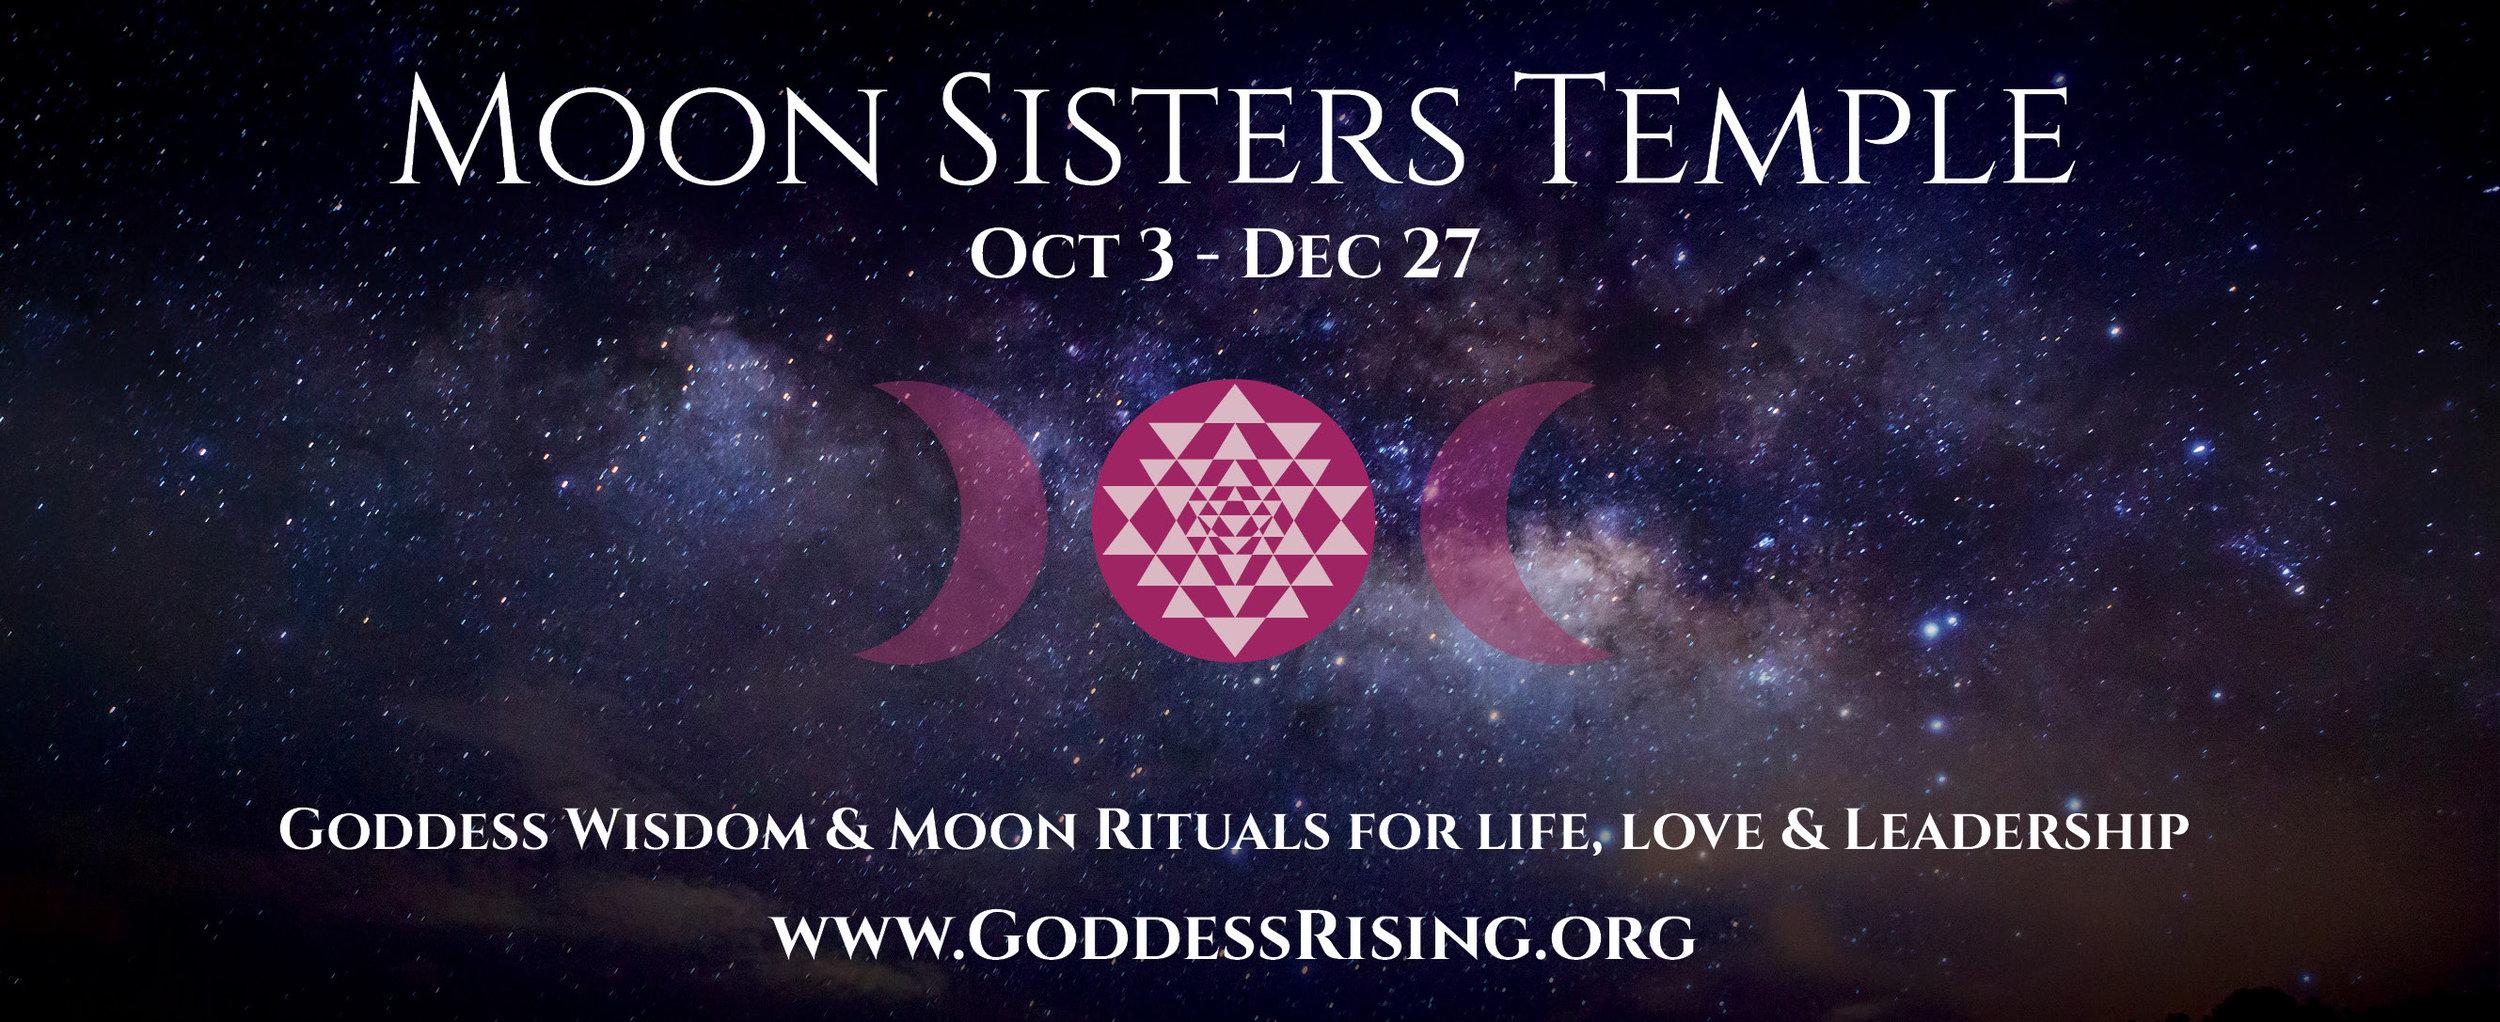 Moon Sisters Temple_oct3_3.jpg